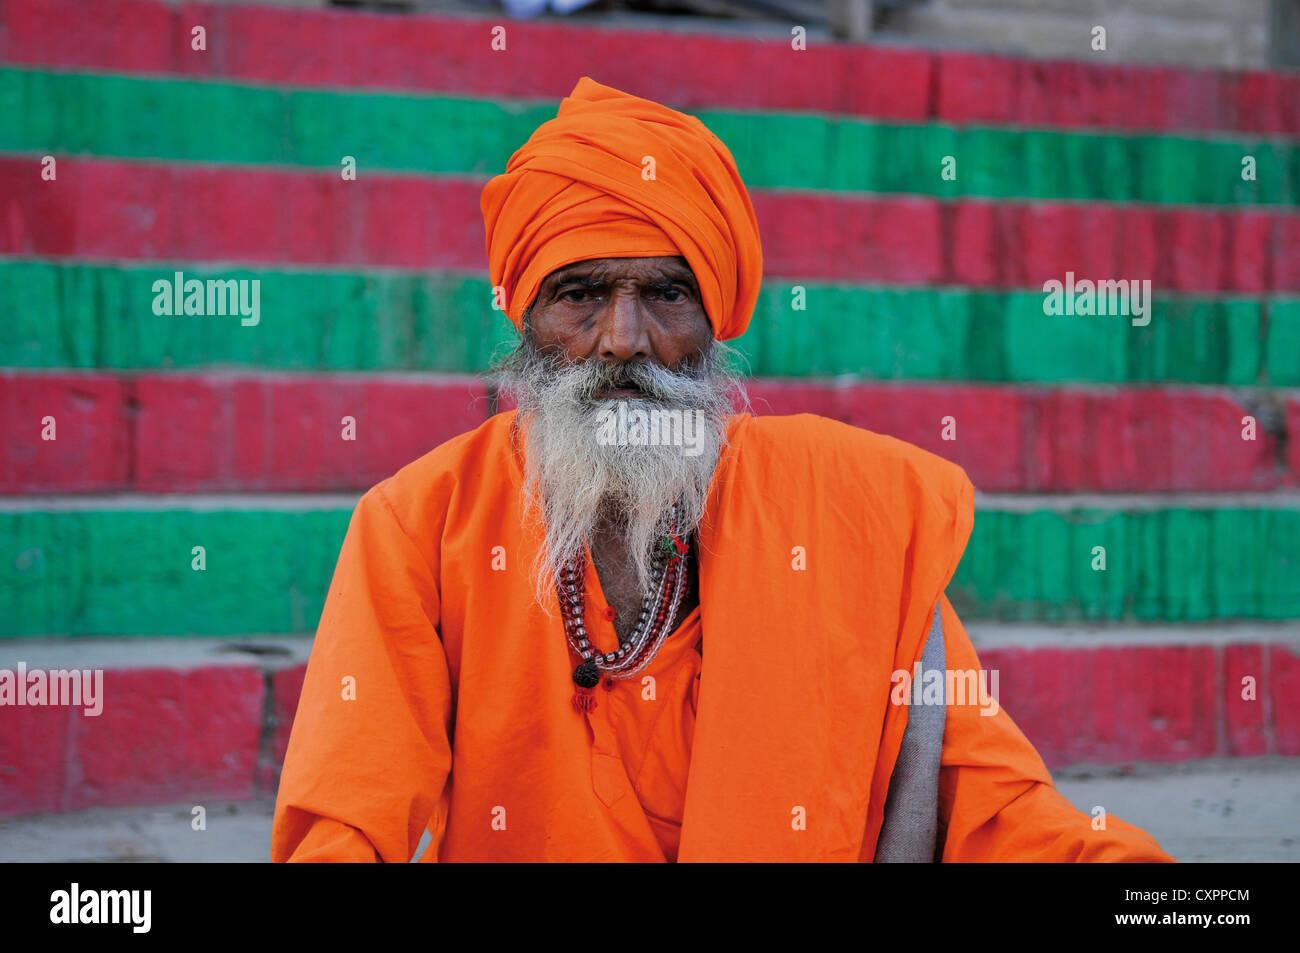 Asie Inde Uttar Pradesh Varanasi Portrait d'un sadhu ascétique ou Photo Stock